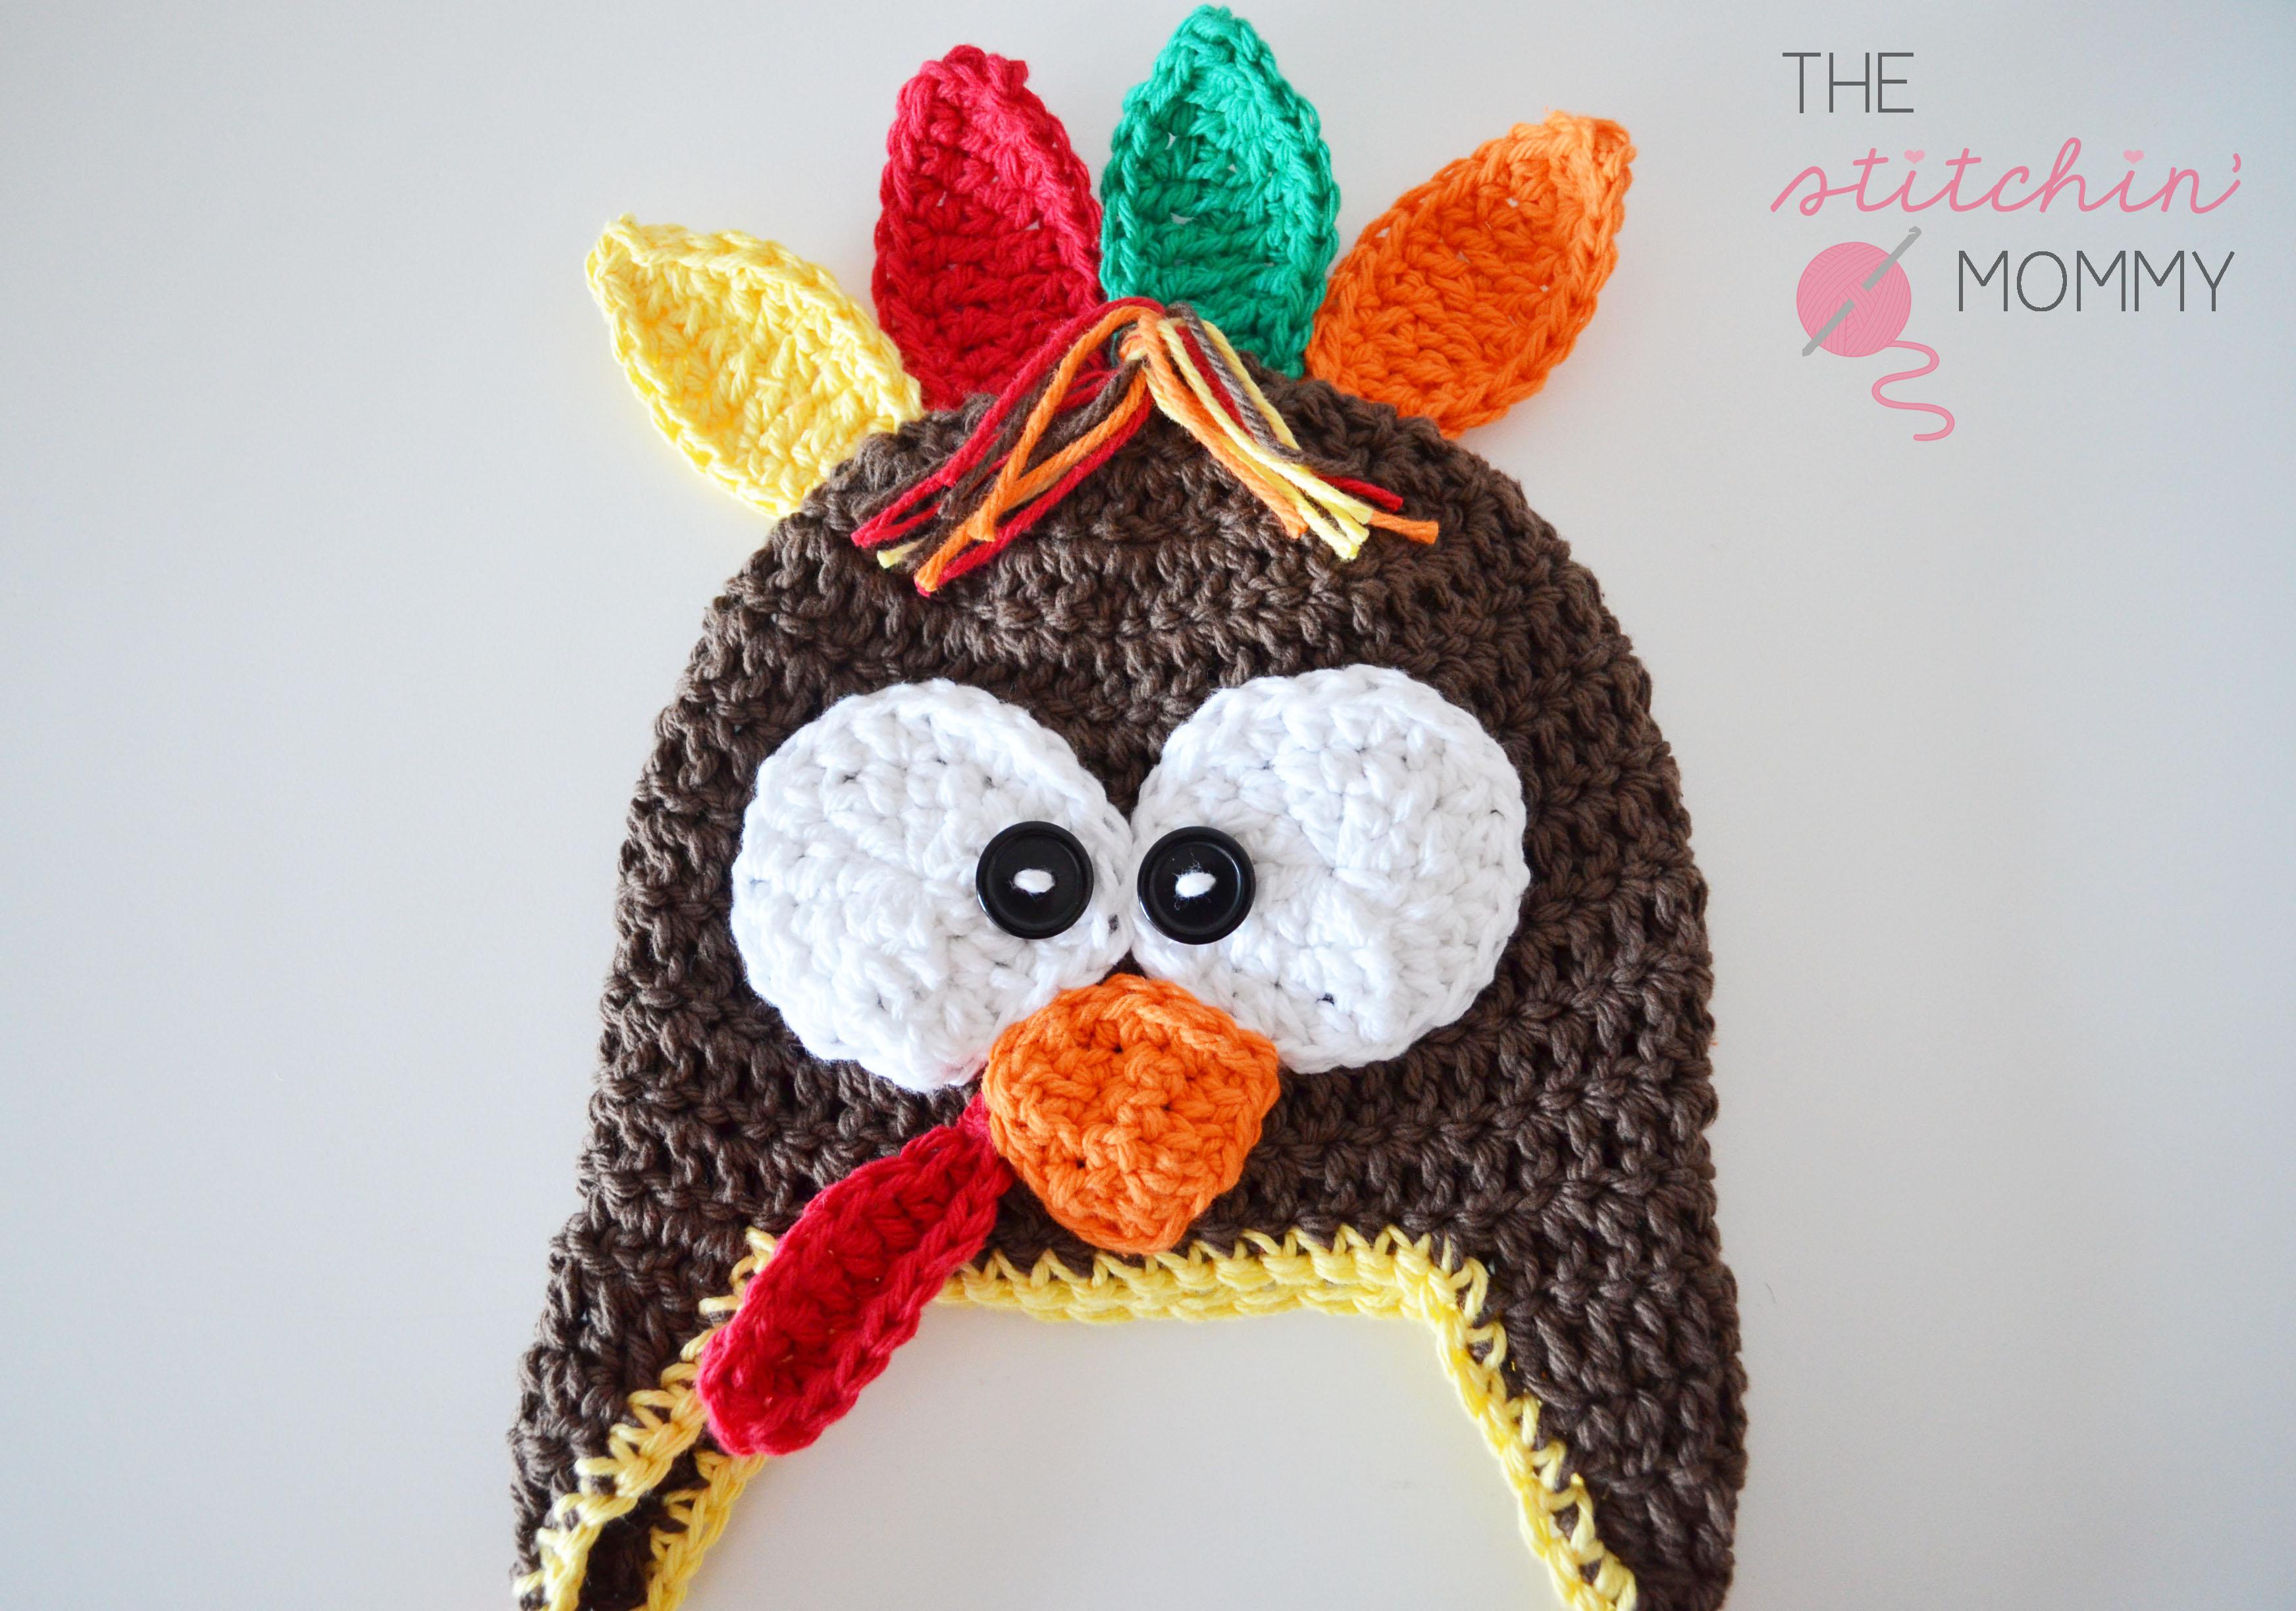 Crochet turkey hat free pattern the stitchin mommy crochet turkey hat free pattern thestitchinmommy bankloansurffo Gallery